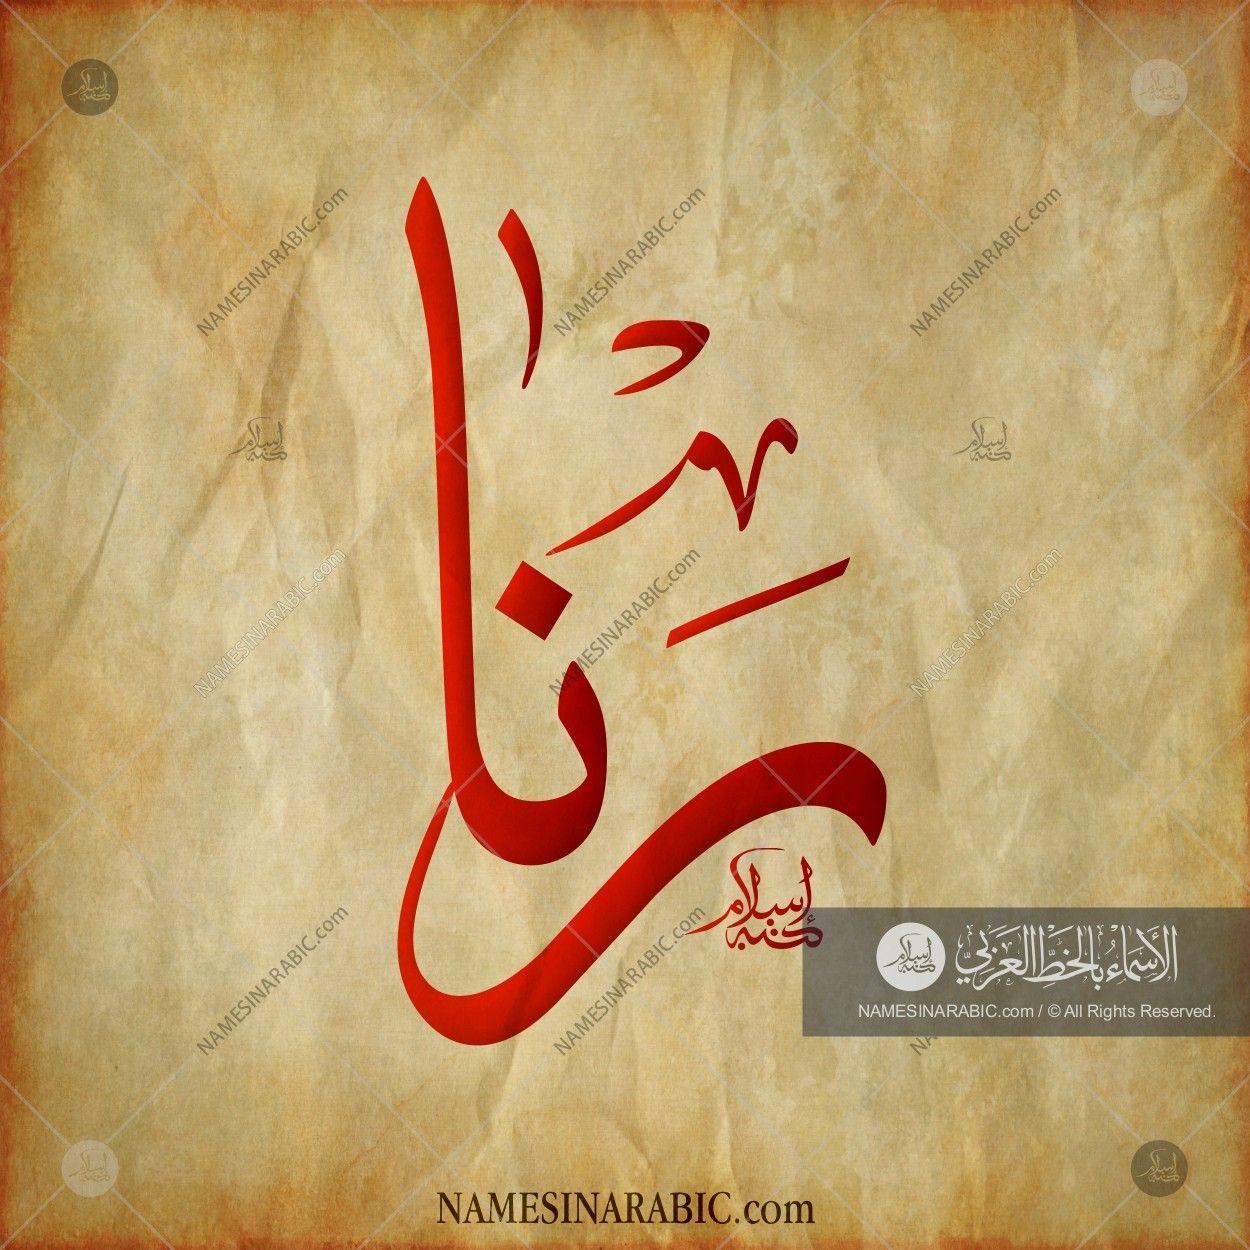 Rana رنا Names In Arabic Calligraphy Name 1739 Islamic Art Calligraphy Calligraphy Calligraphy Words